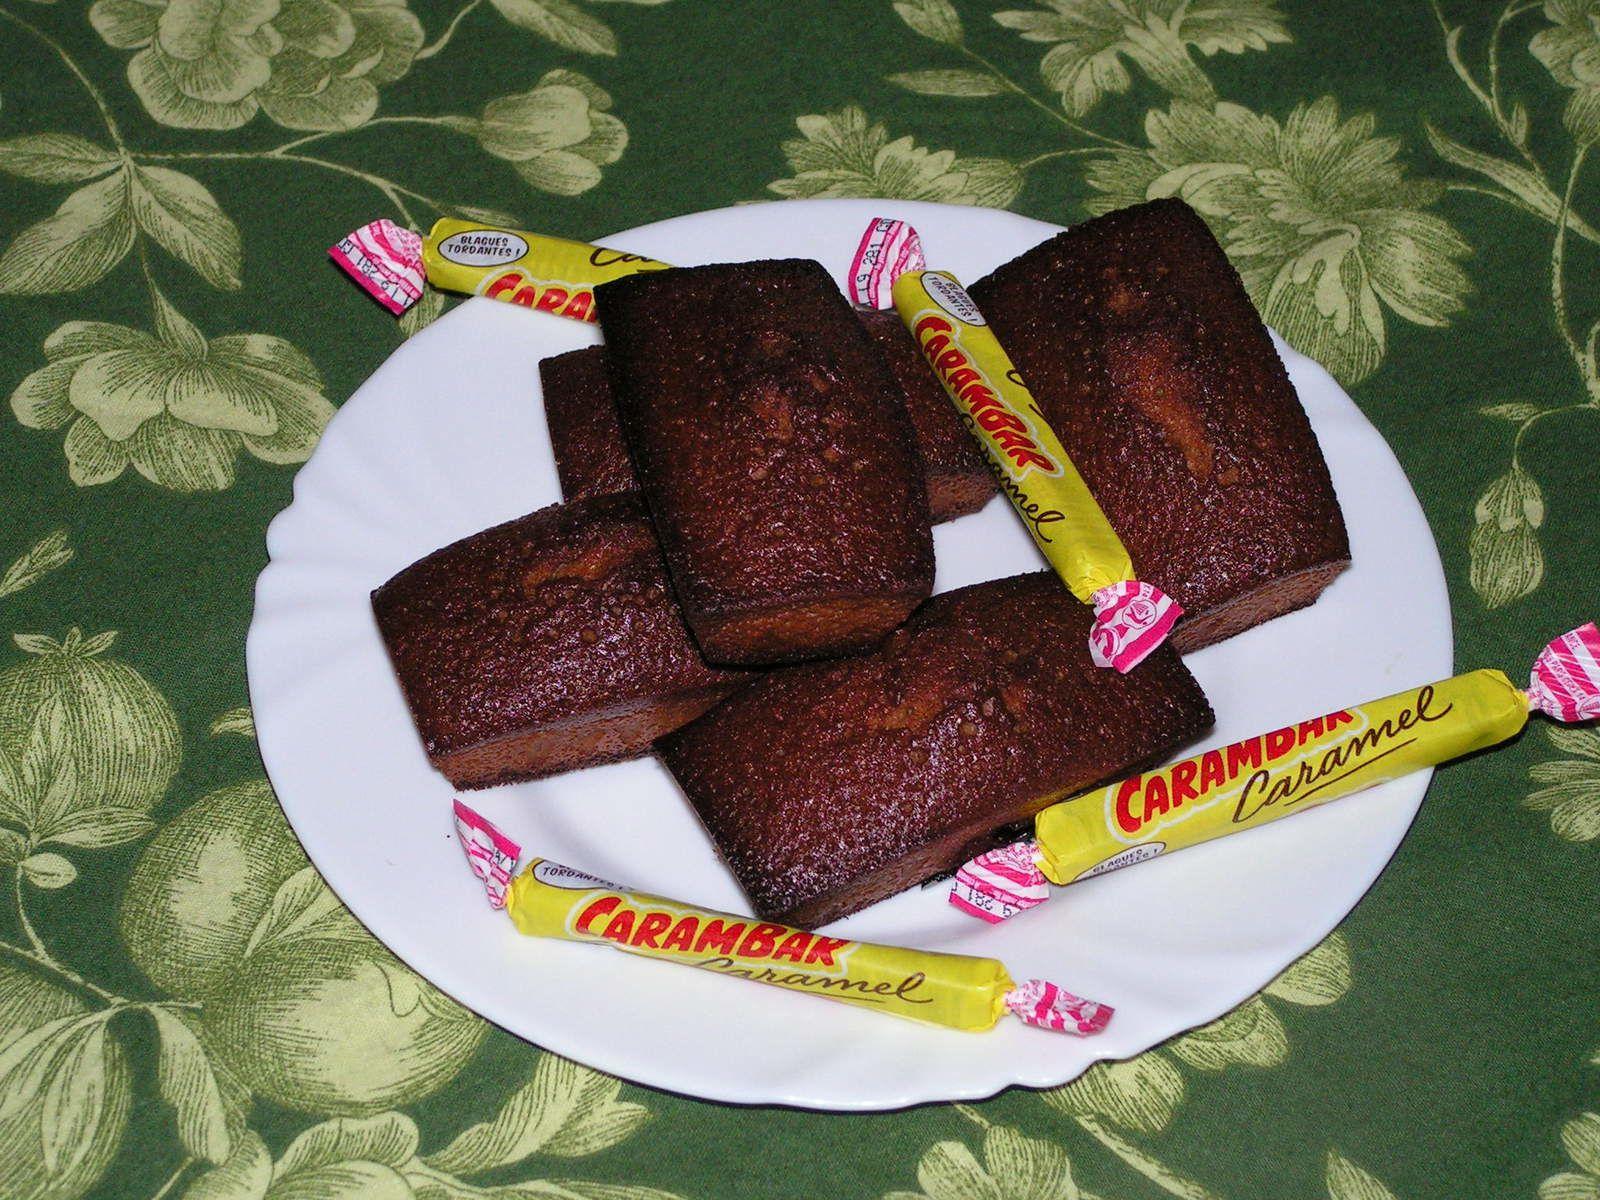 Petits cakes aux carambars